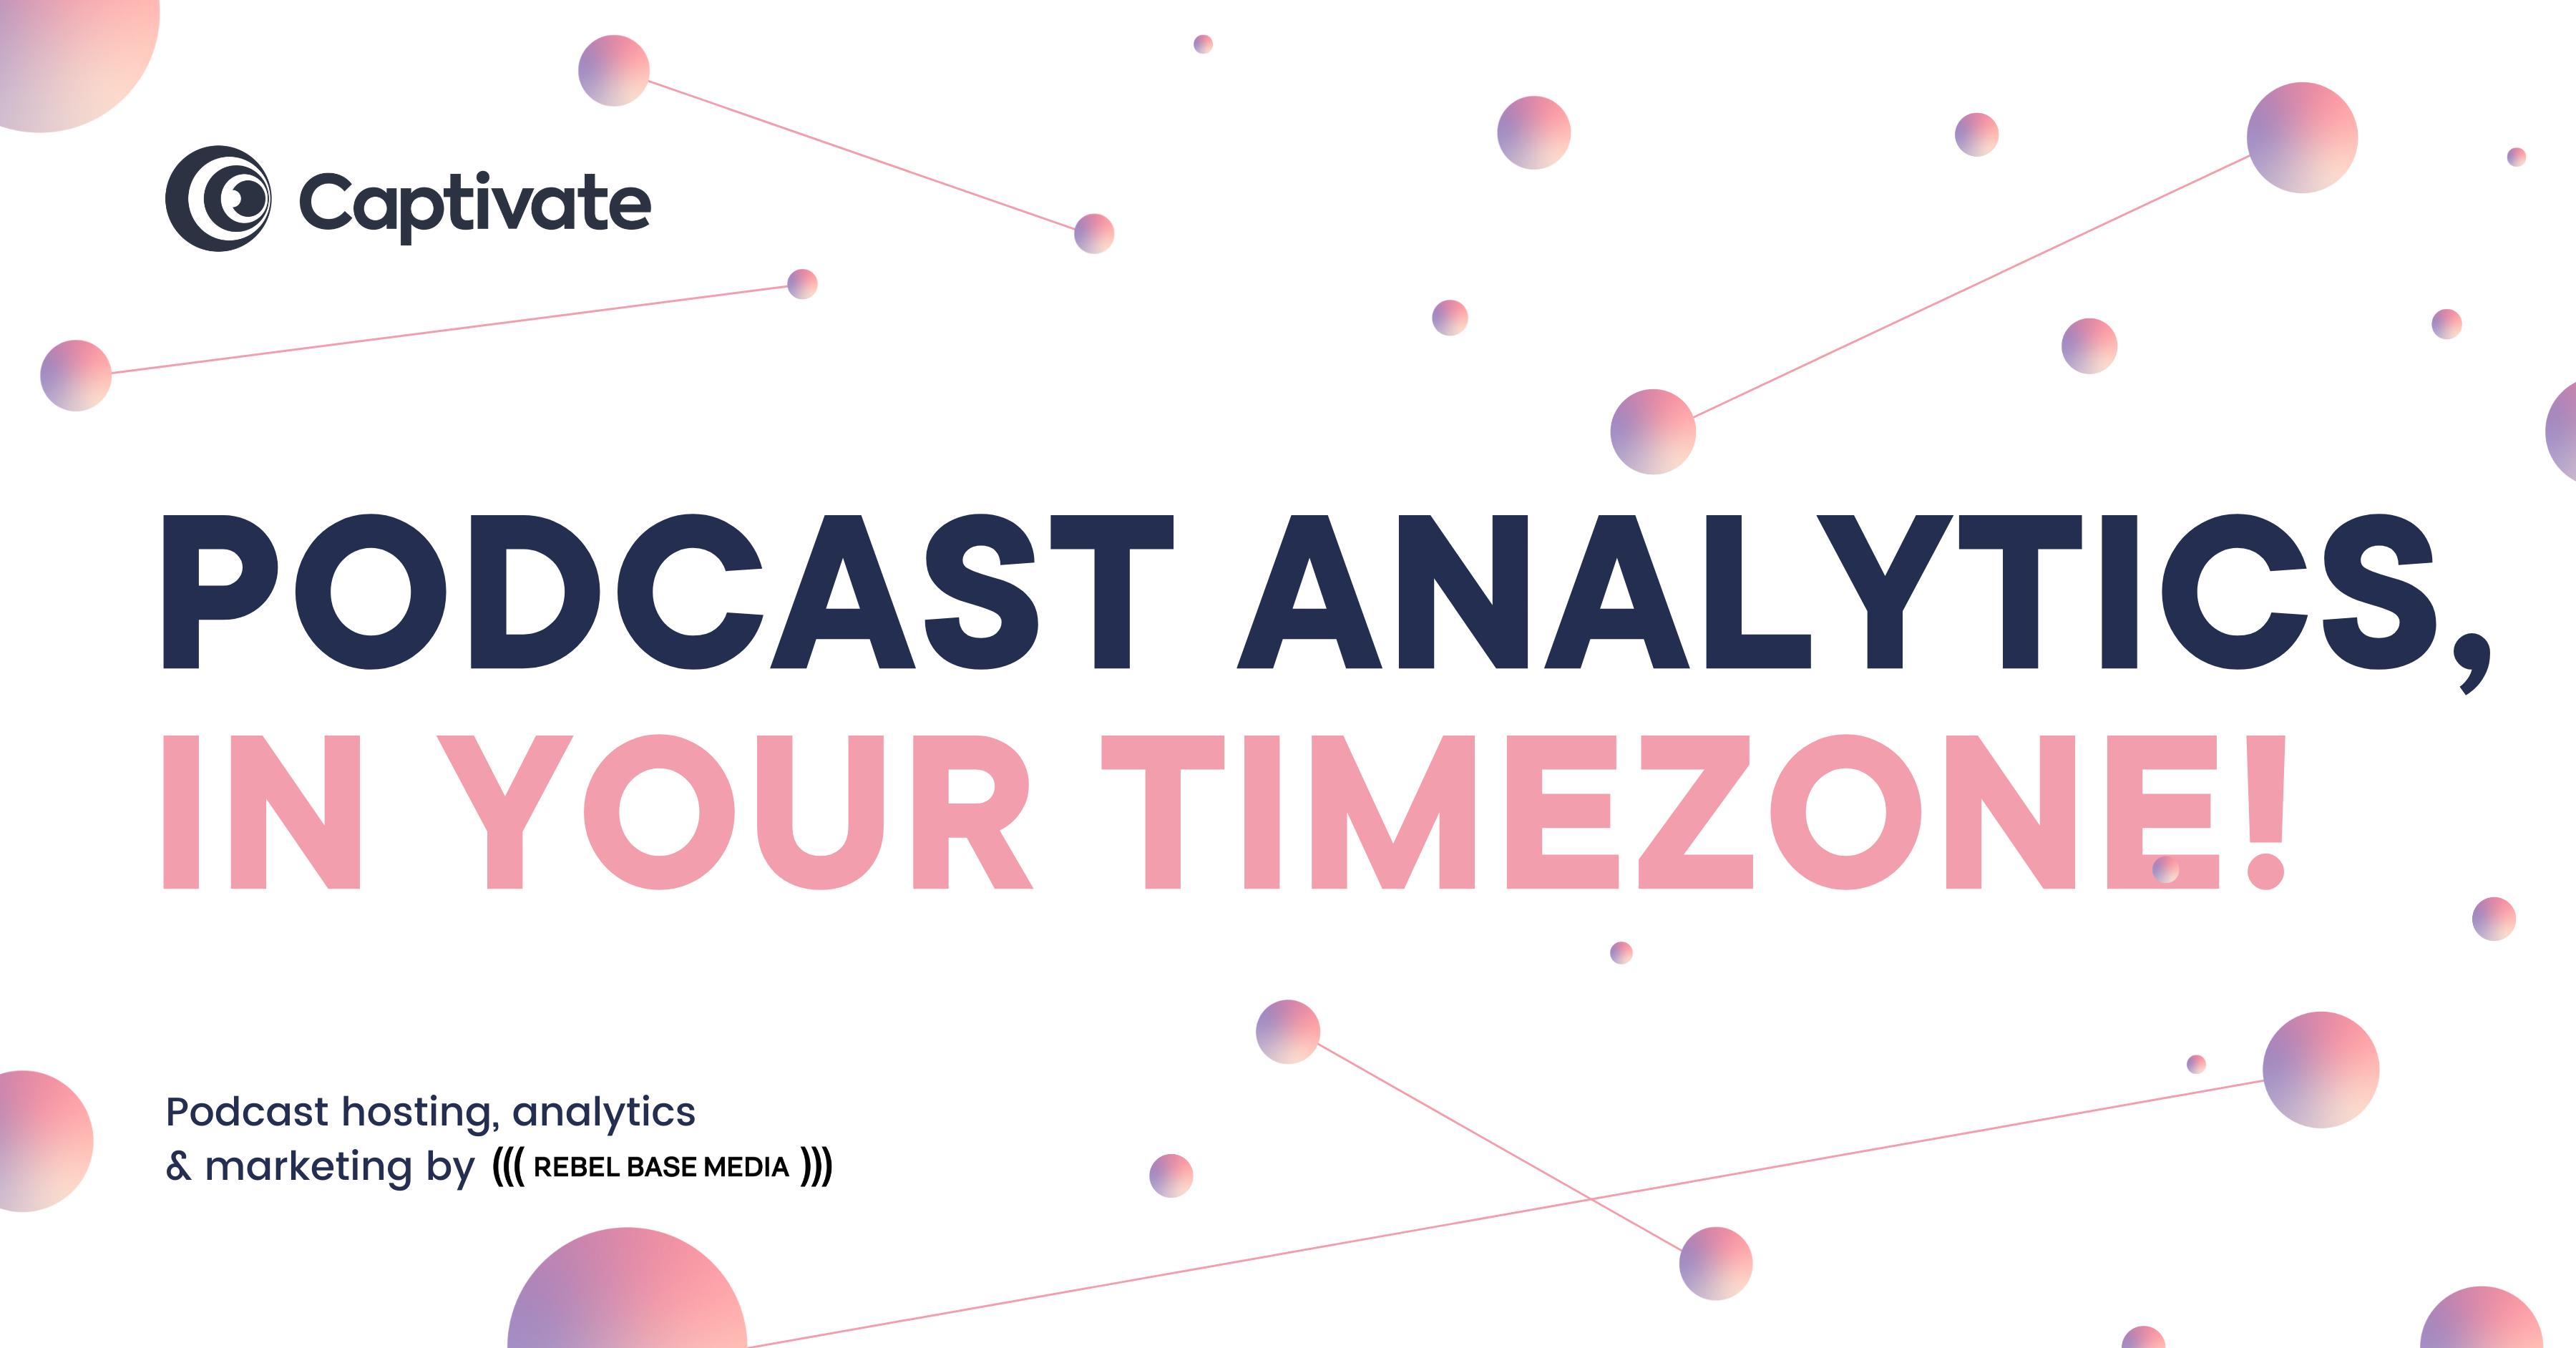 Captivate podcast hosting analytics in timezones